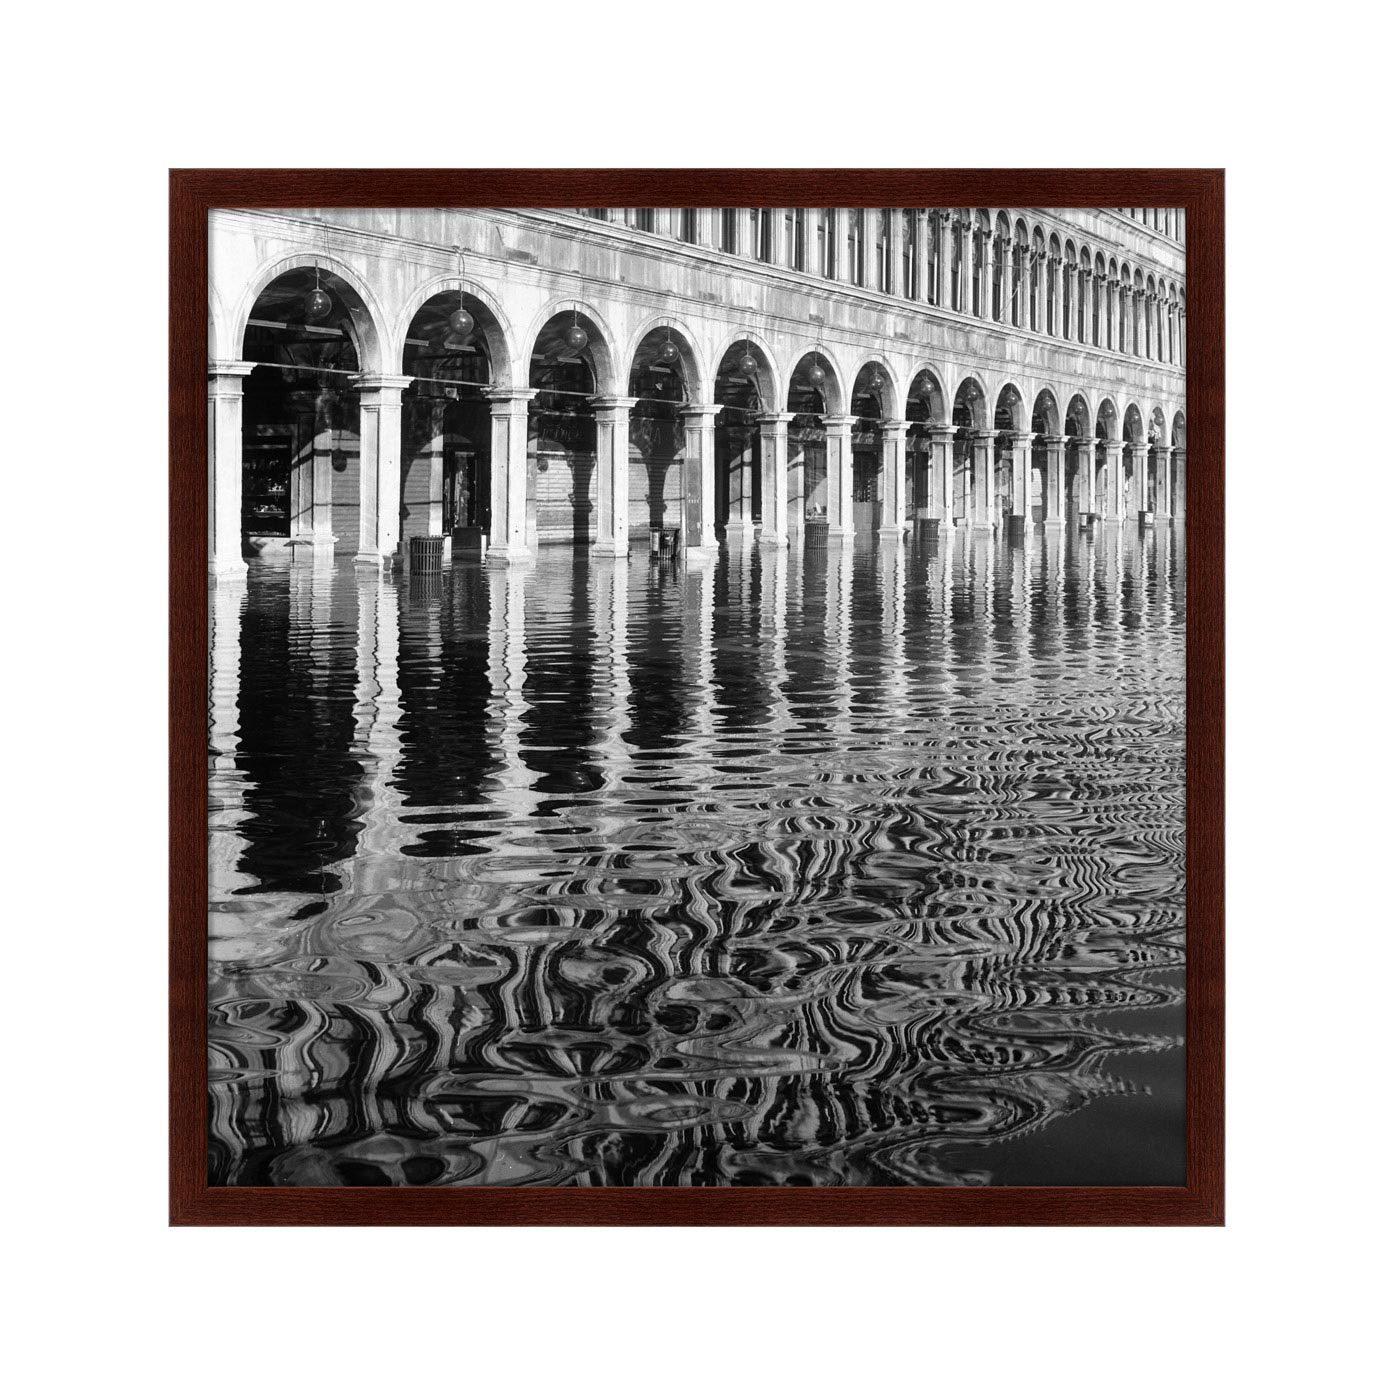 {} Картины в Квартиру Картина Венеция, Утро (79х79 см) картины в квартиру картина дерево на воде 102х130 см